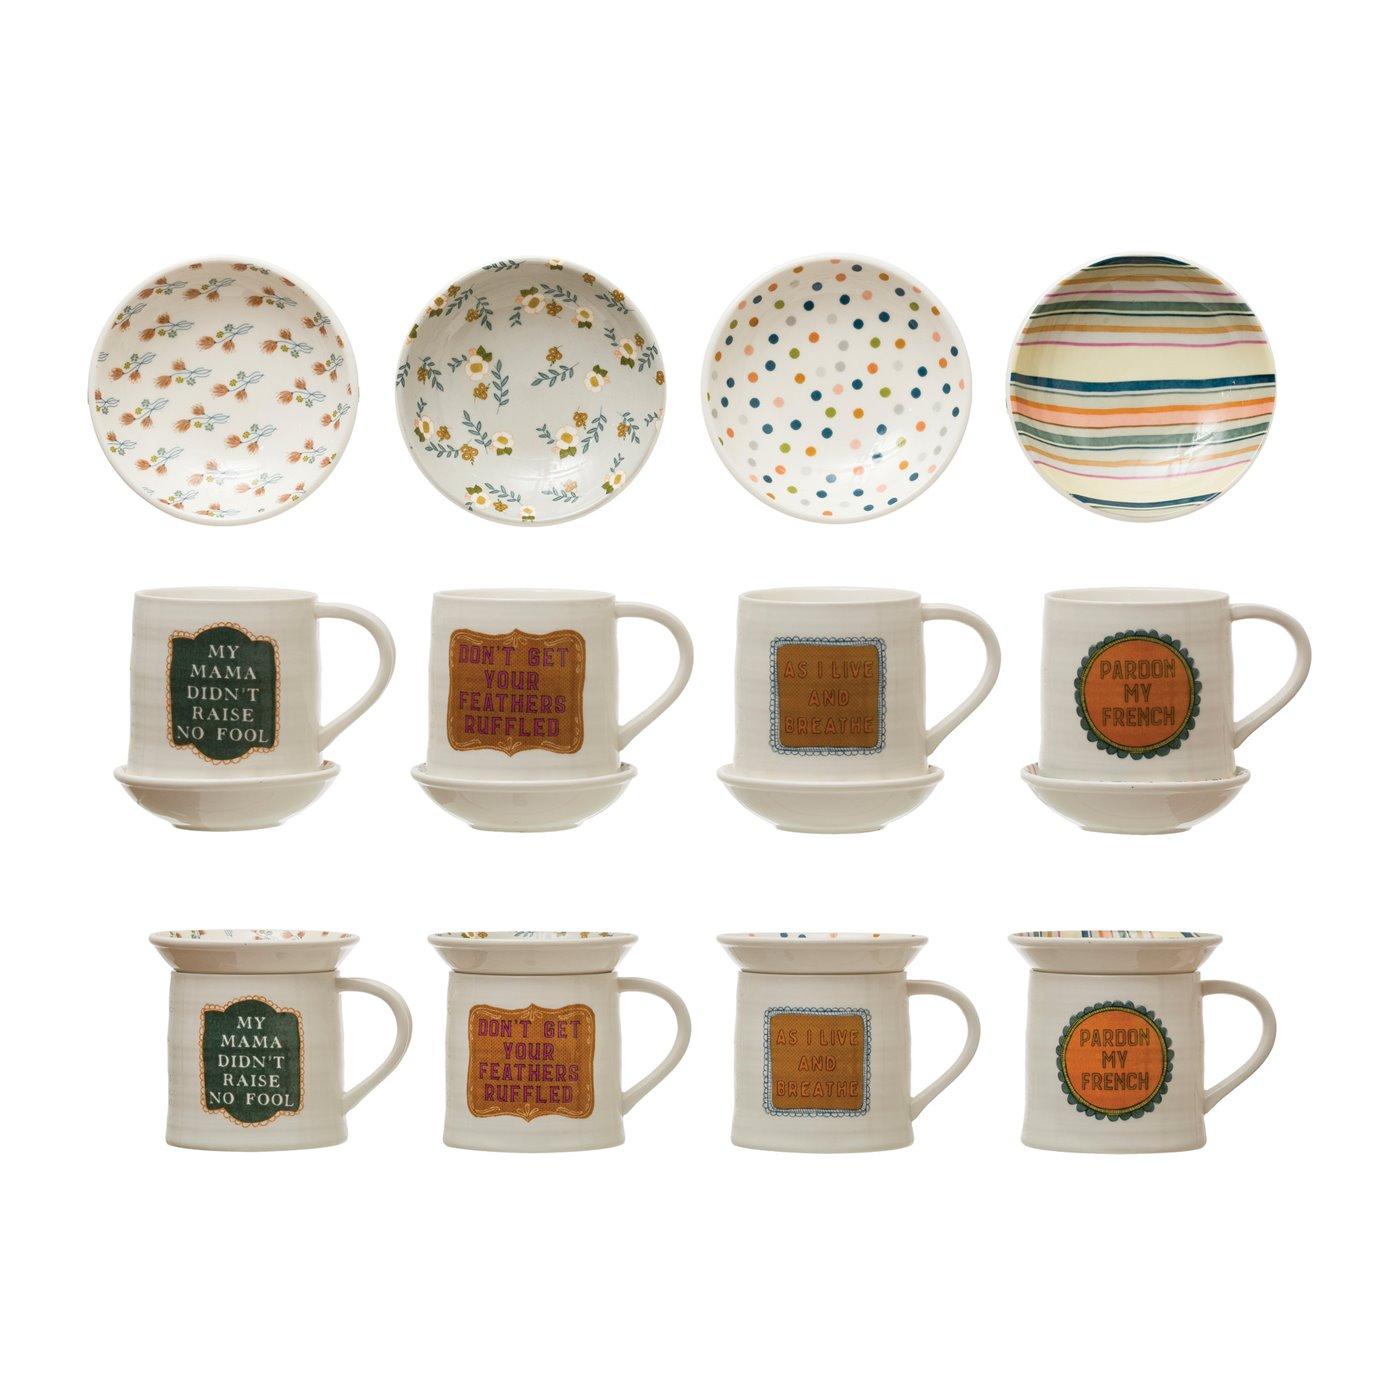 "12 oz. Stoneware Mug w/ 4-1/4"" Round Snack Plate Topper & Saying, Set of 2, 4 Styles ©"